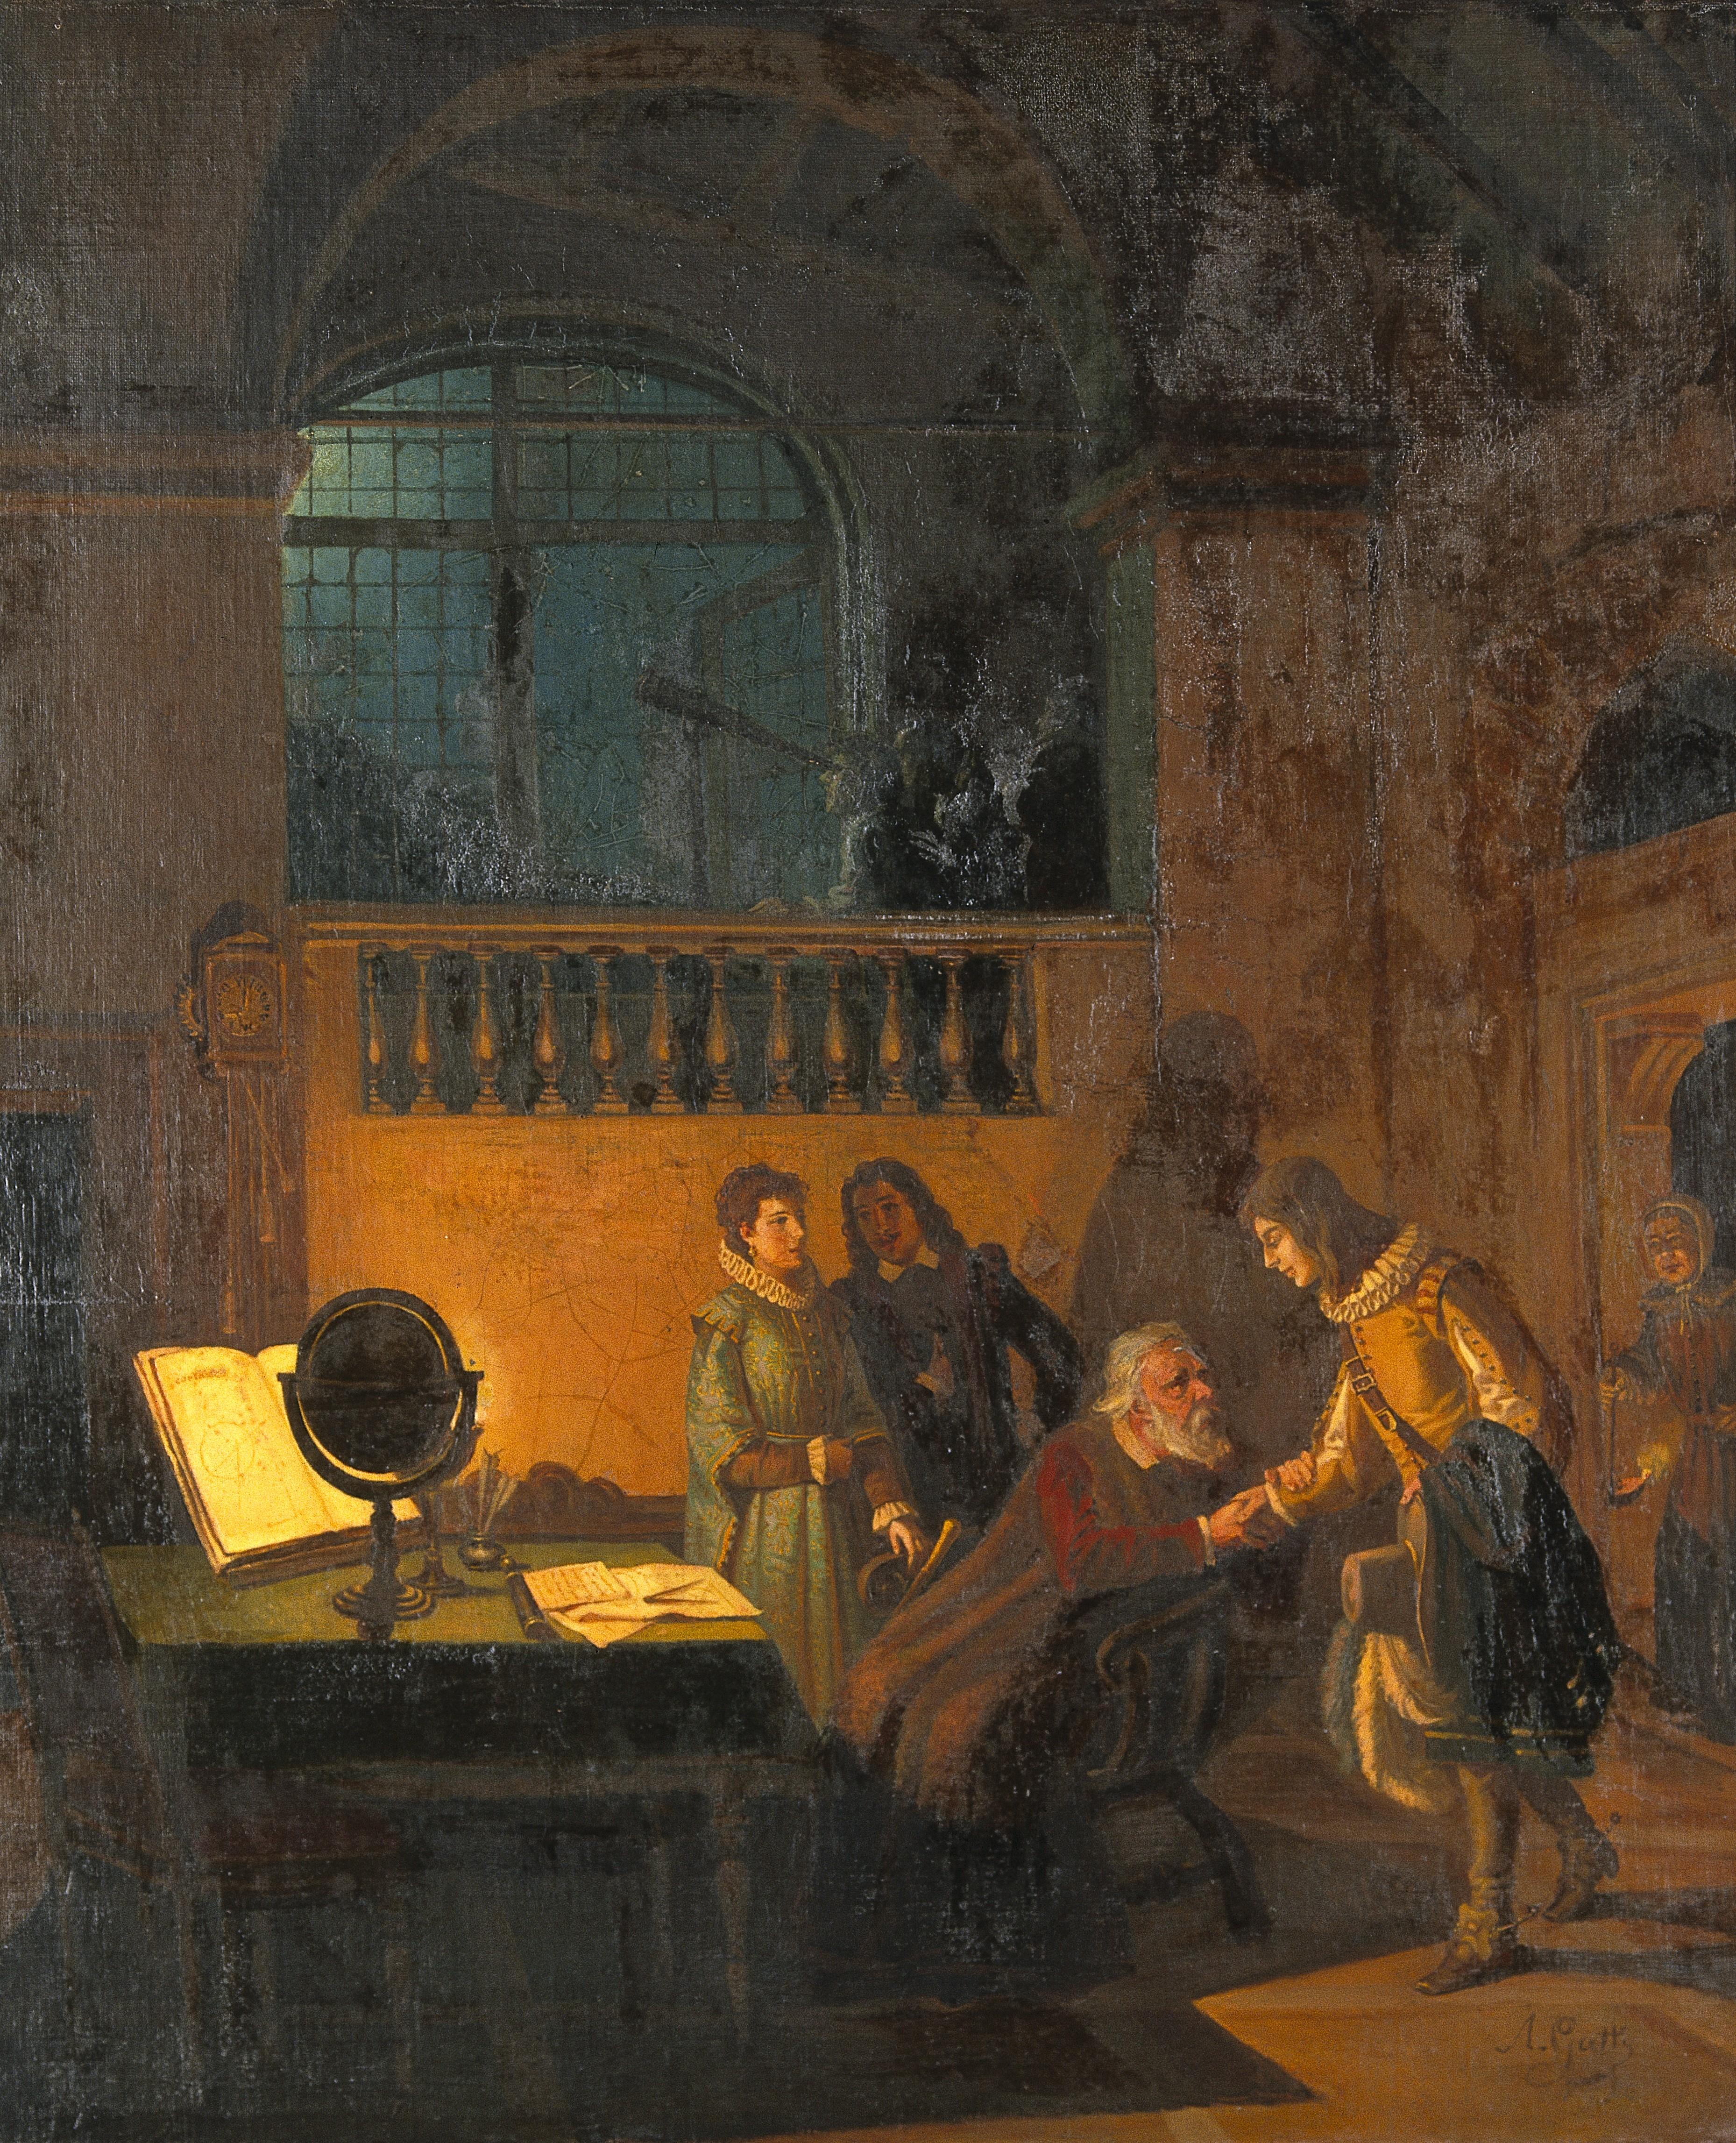 FileGalileo Galilei Receiving John Milton Oil Painting By Annib Wellcome V0017870